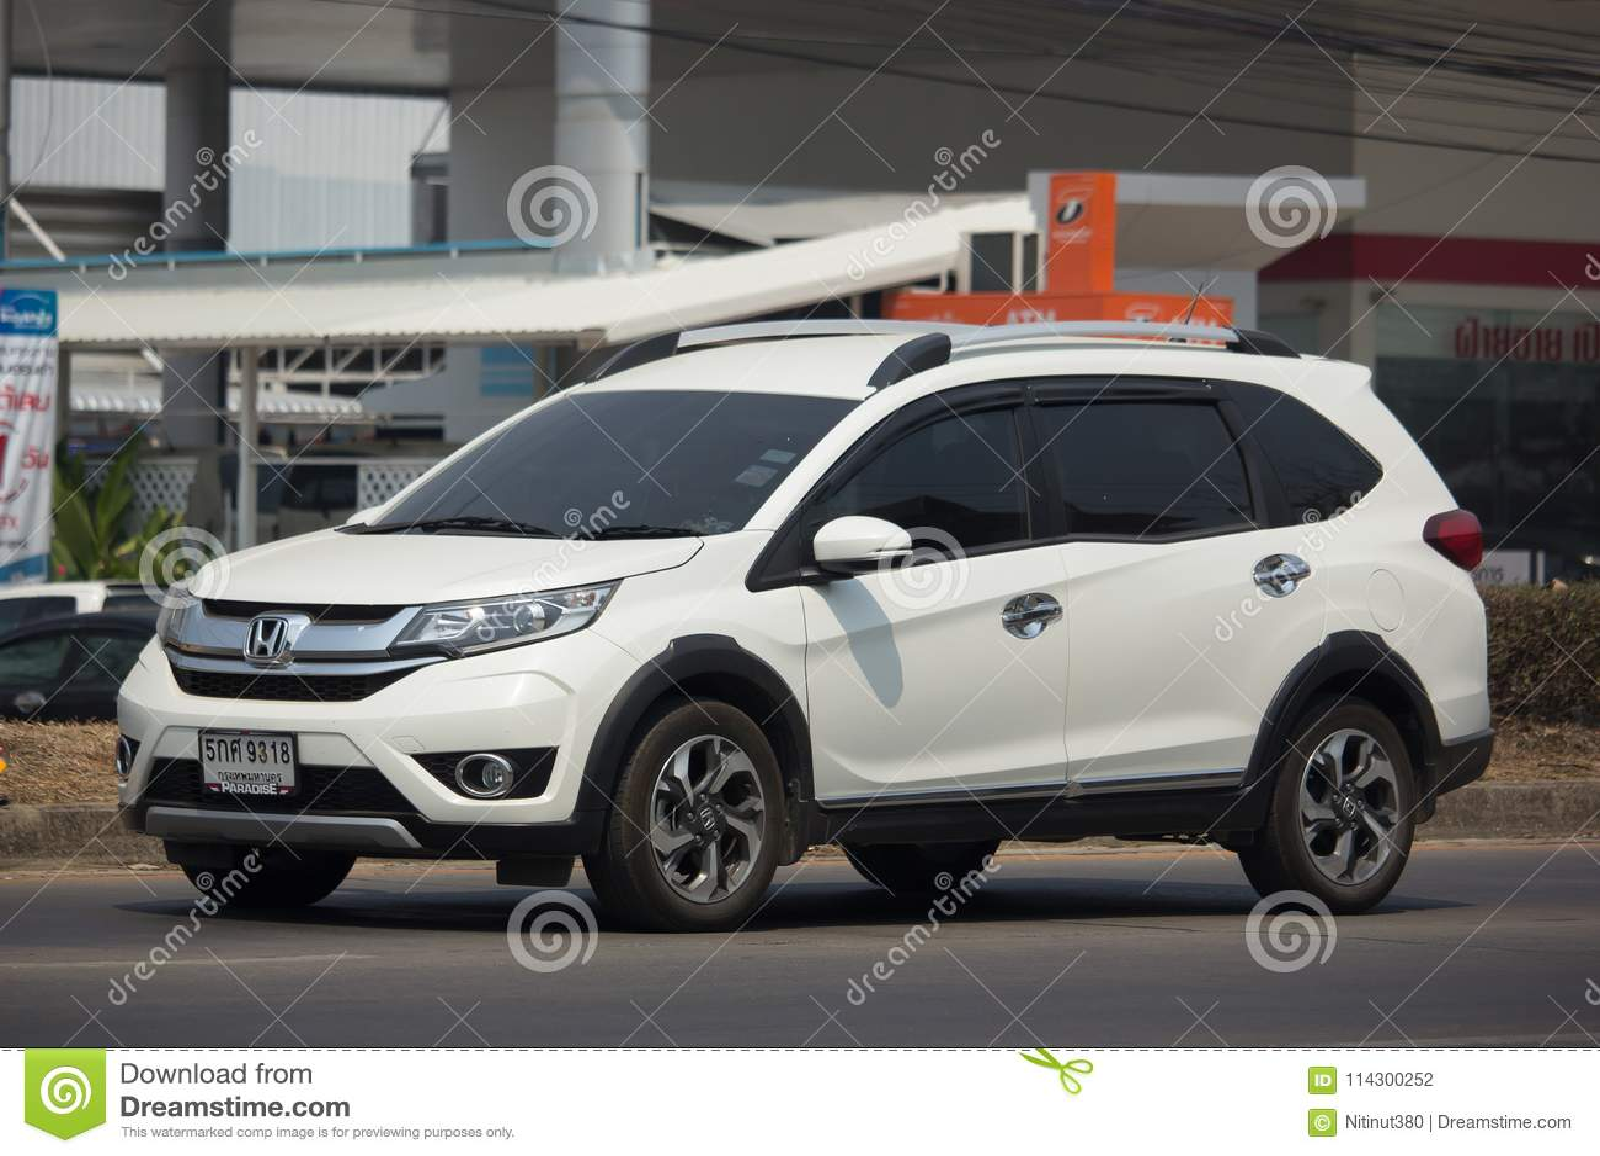 Private Honda Mobilio Van Editorial Photography Image Of Auto